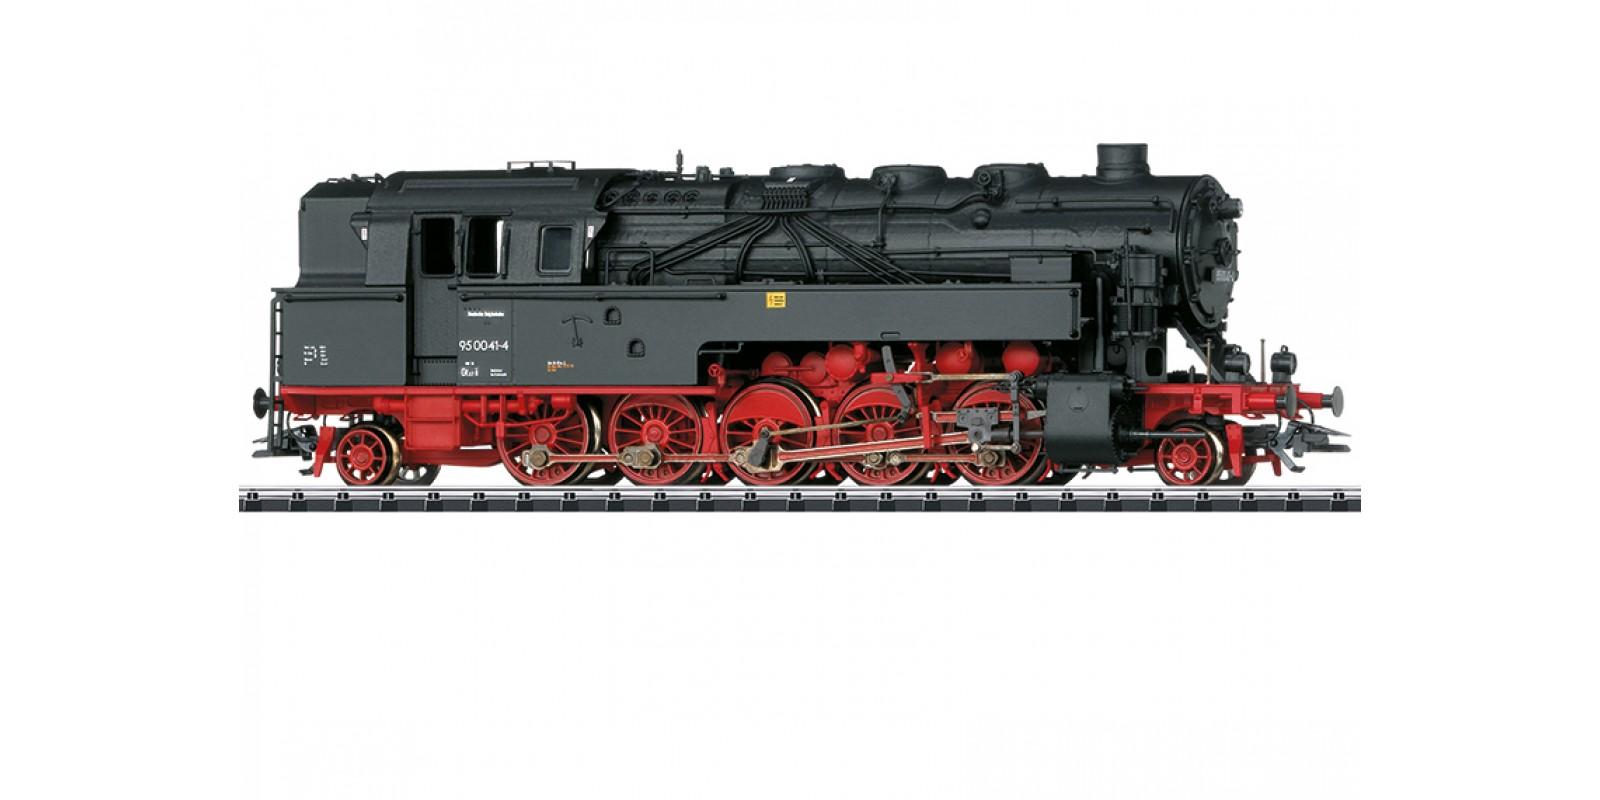 T25097 - Class 95.0 Steam Locomotive with Oil Firing